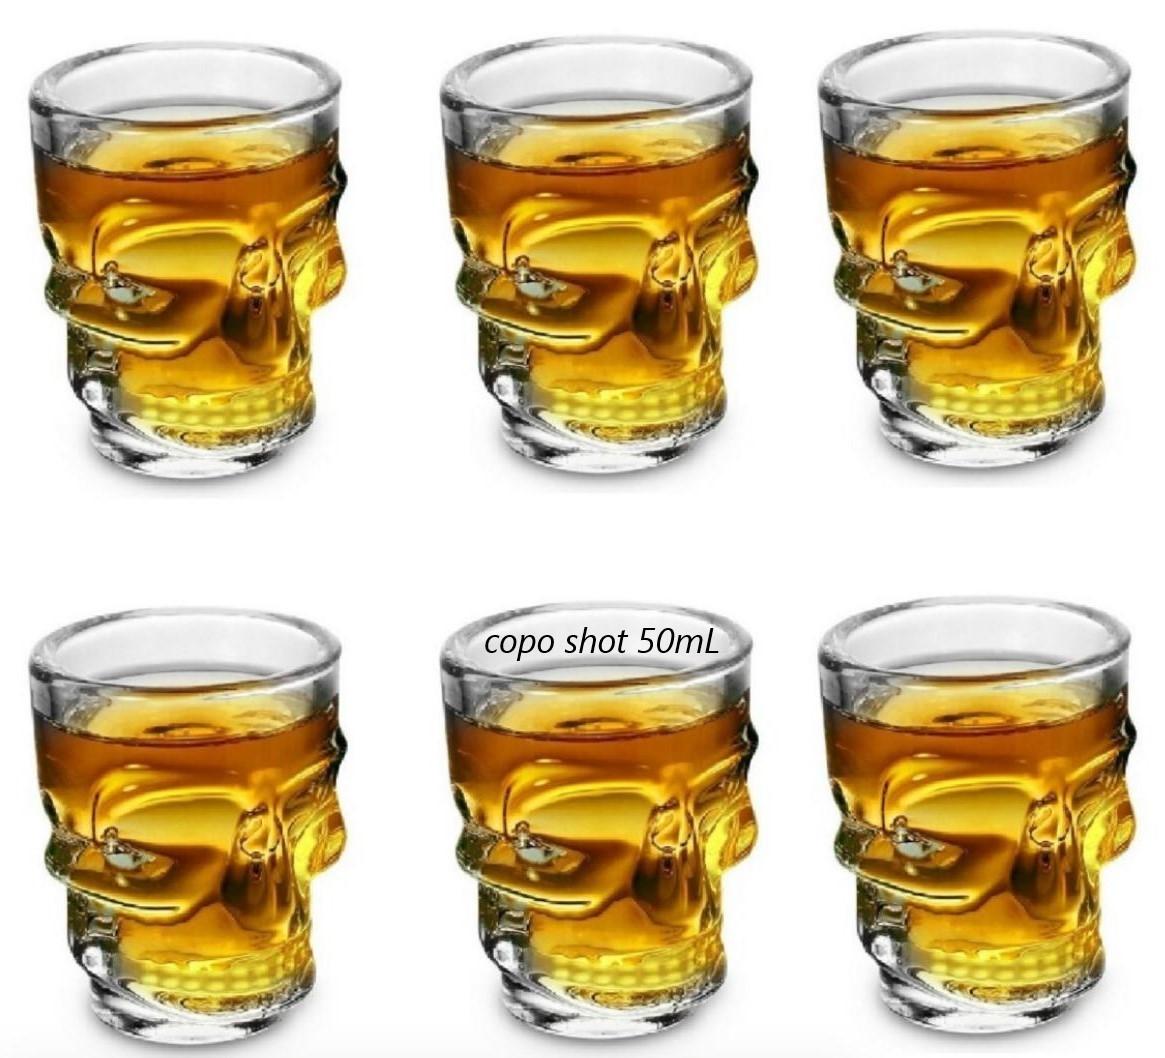 copo shot caveira dose vidro tequila whisky vodka licor bebidas jogo 6 copos 50mL bar